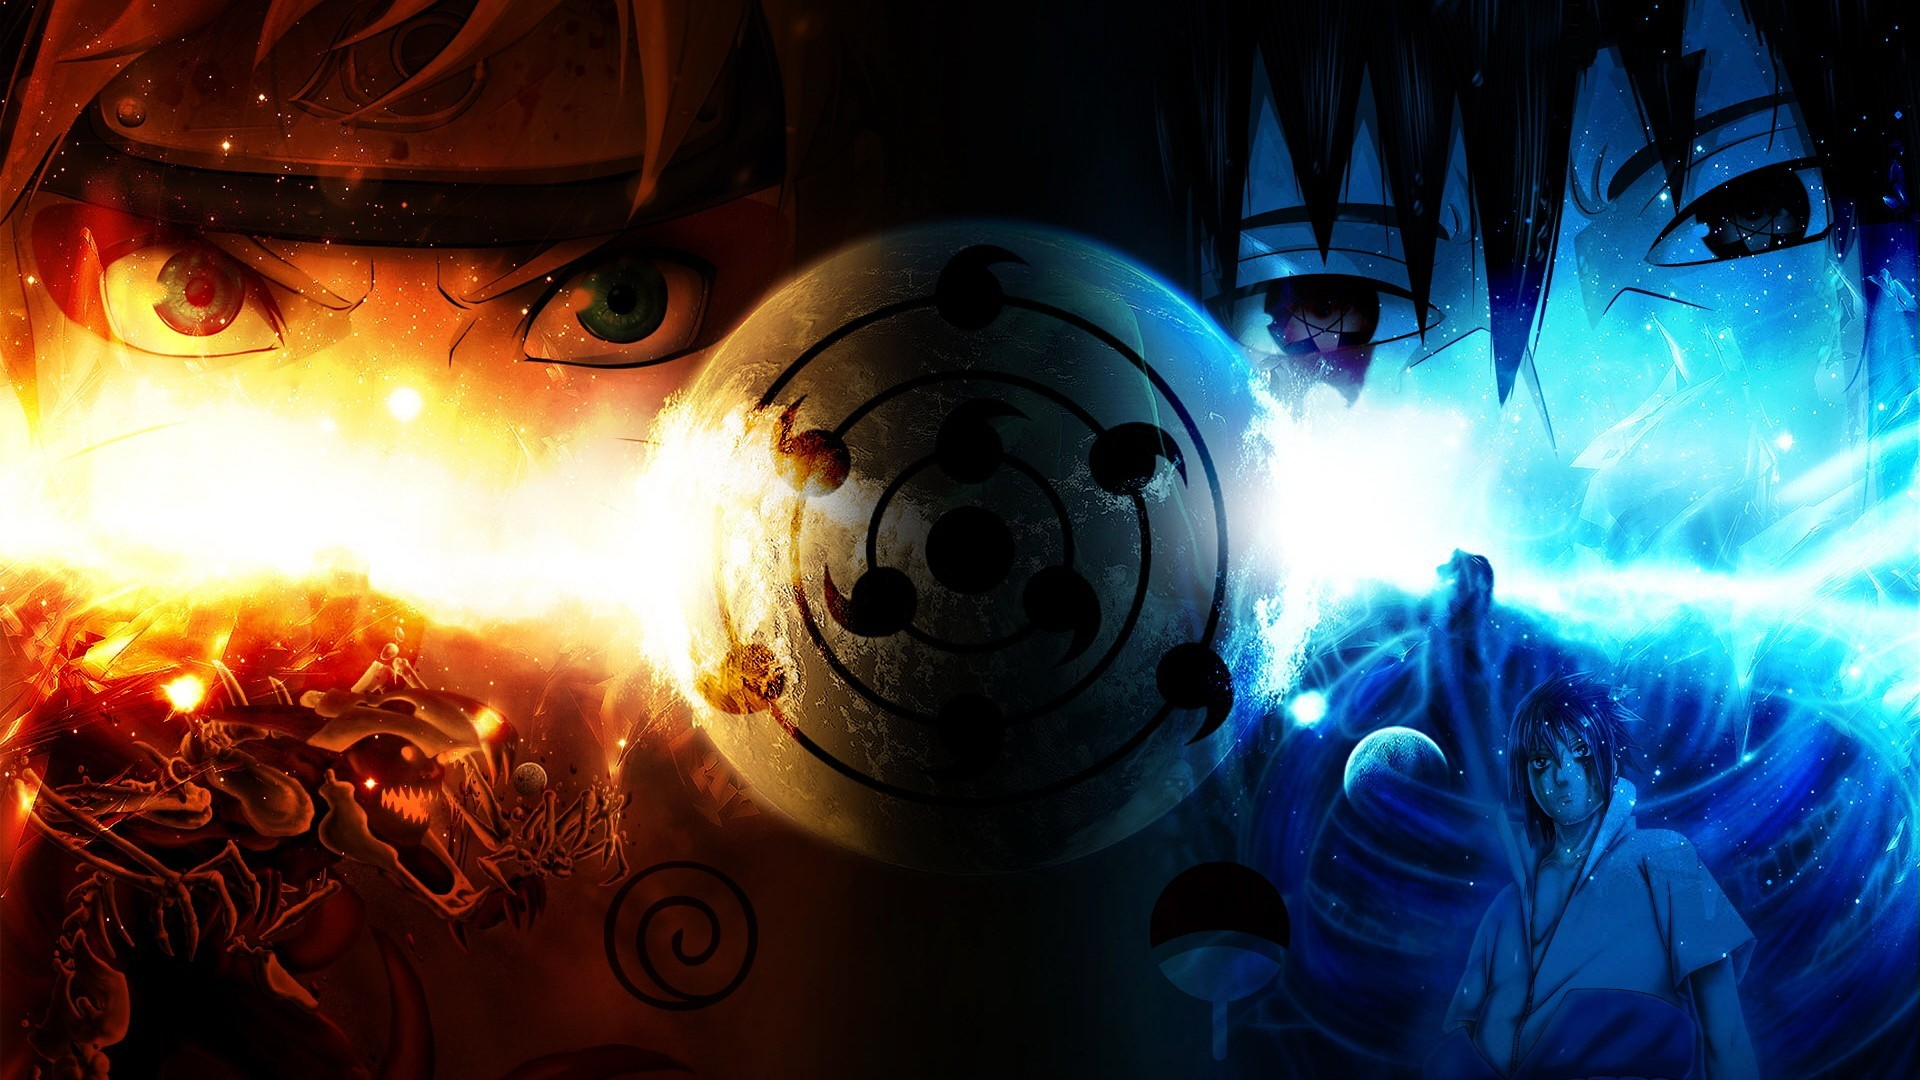 Naruto Sasuke Hd Wallpaper Background Image 1920x1080 Id